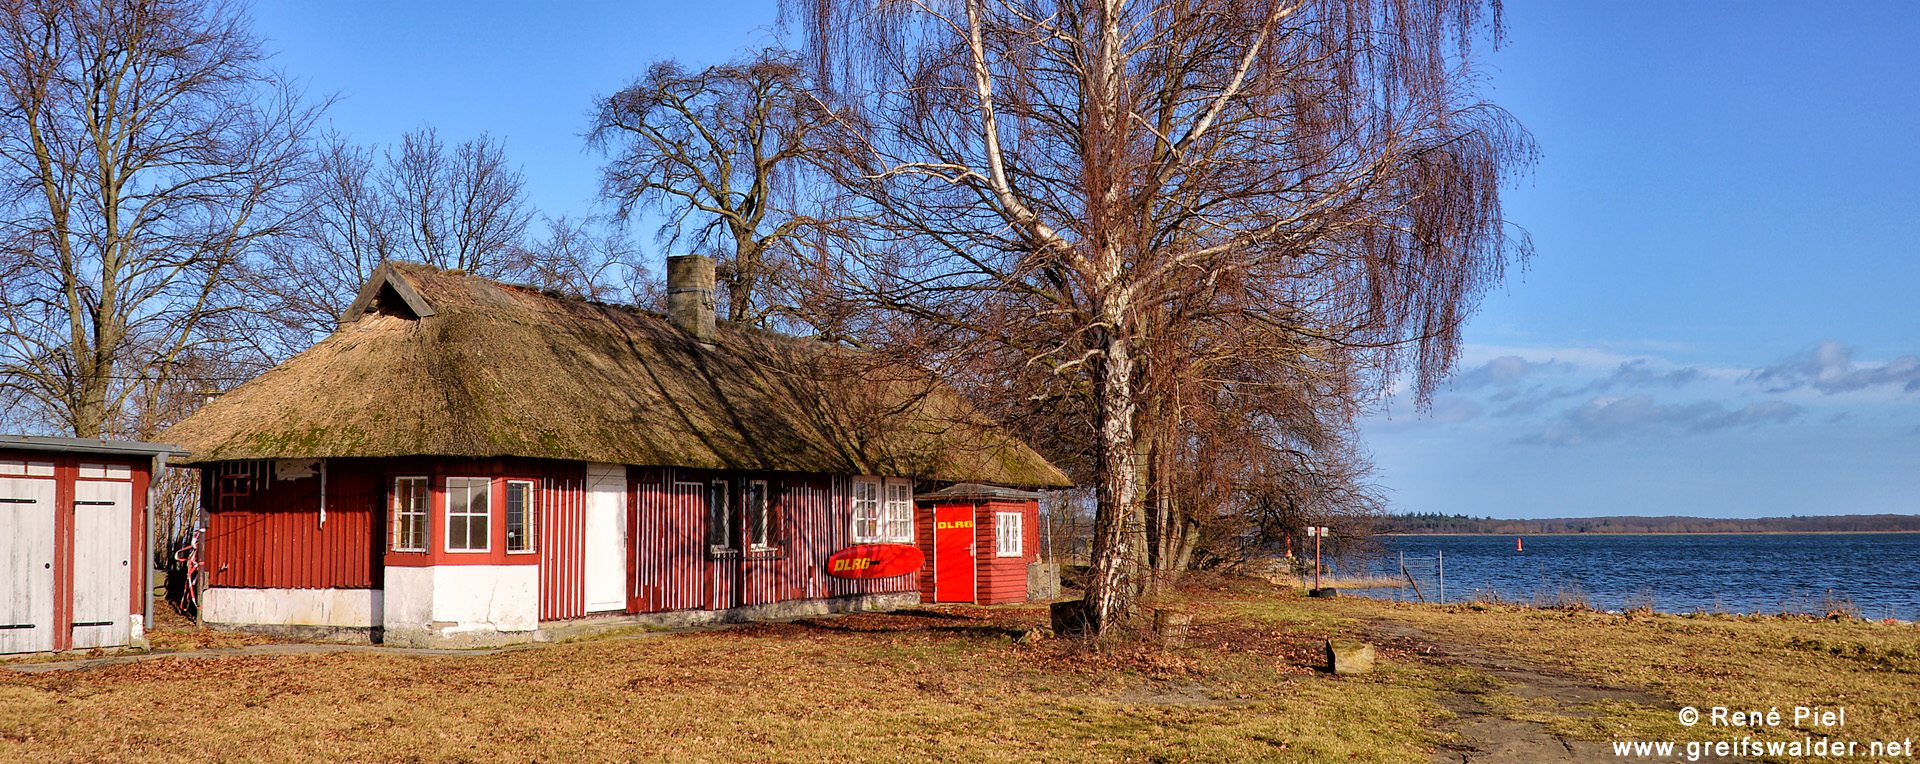 DLRG Greifswald - Badehaus Eldena